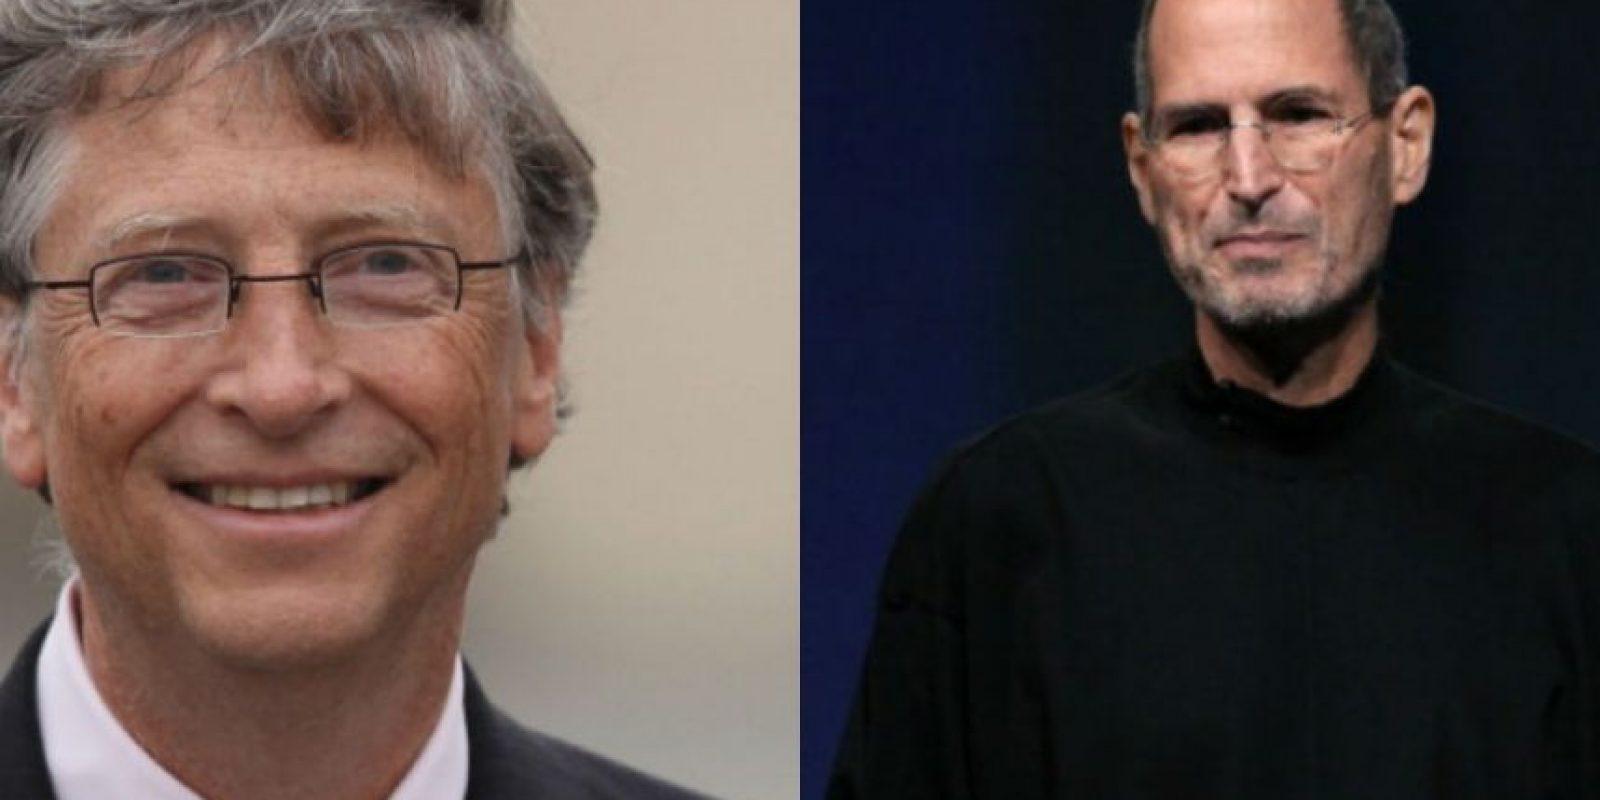 Bill Gates recuerda con cariño a Steve Jobs. Foto:Getty Images